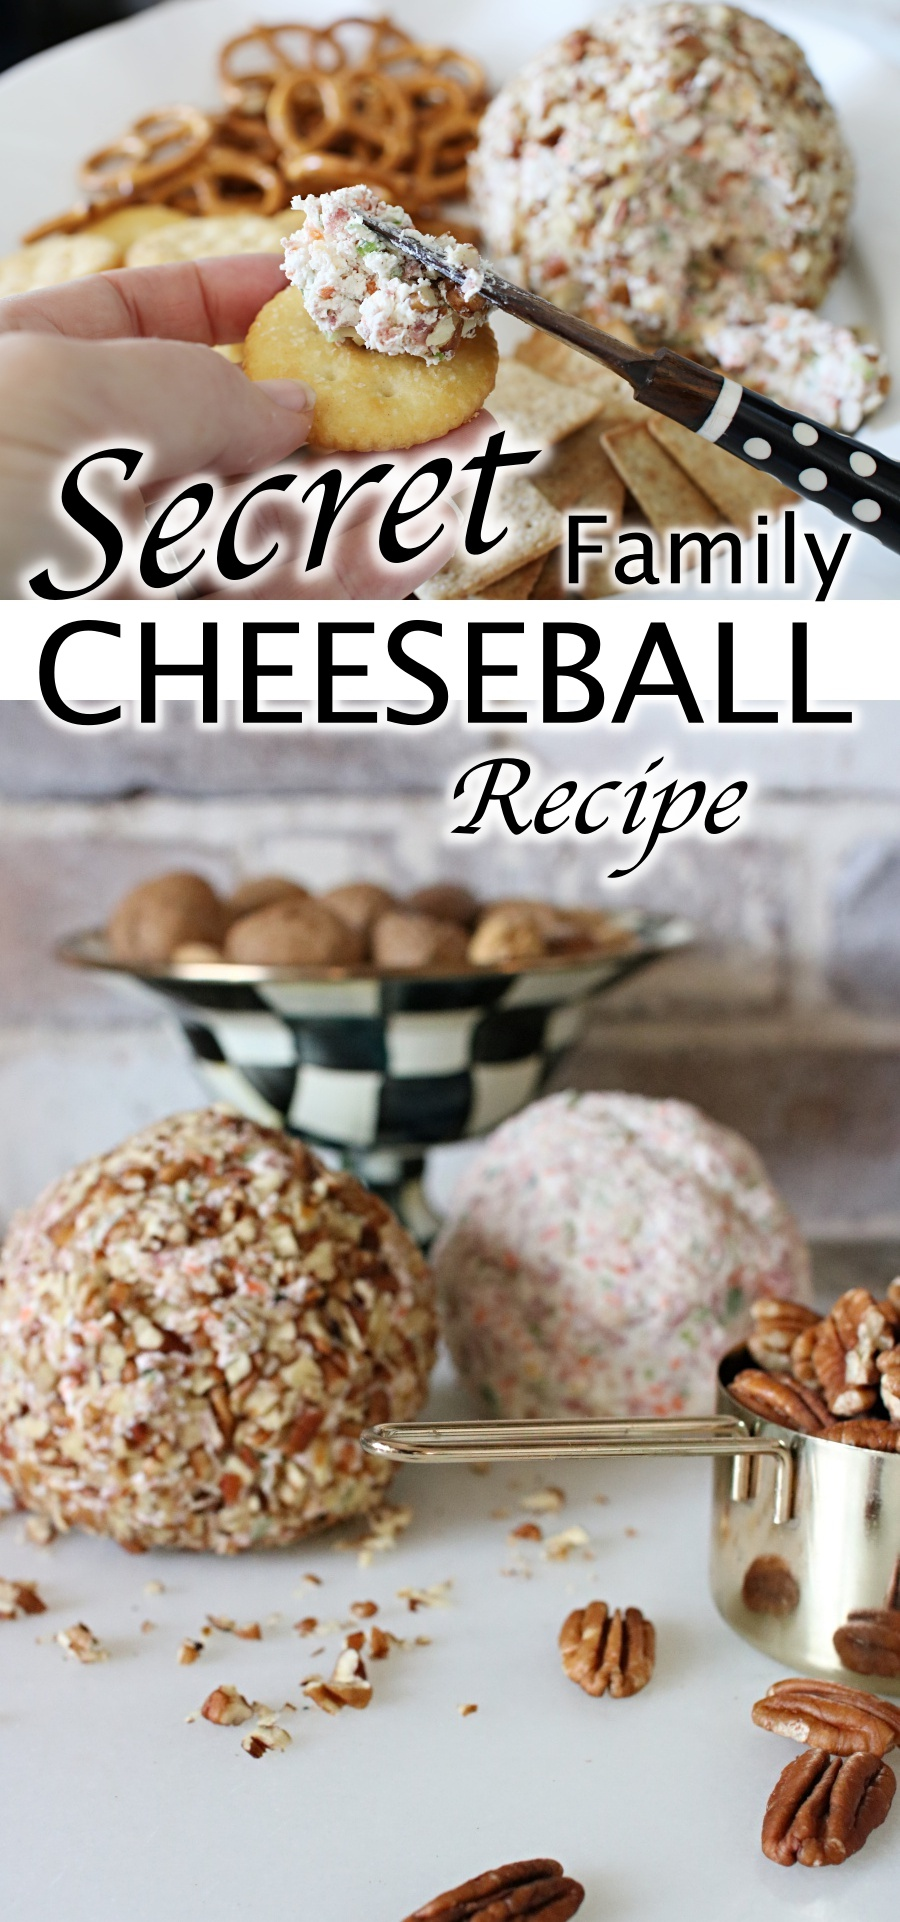 Creamy Cheeseball- Secret family recipe revealed